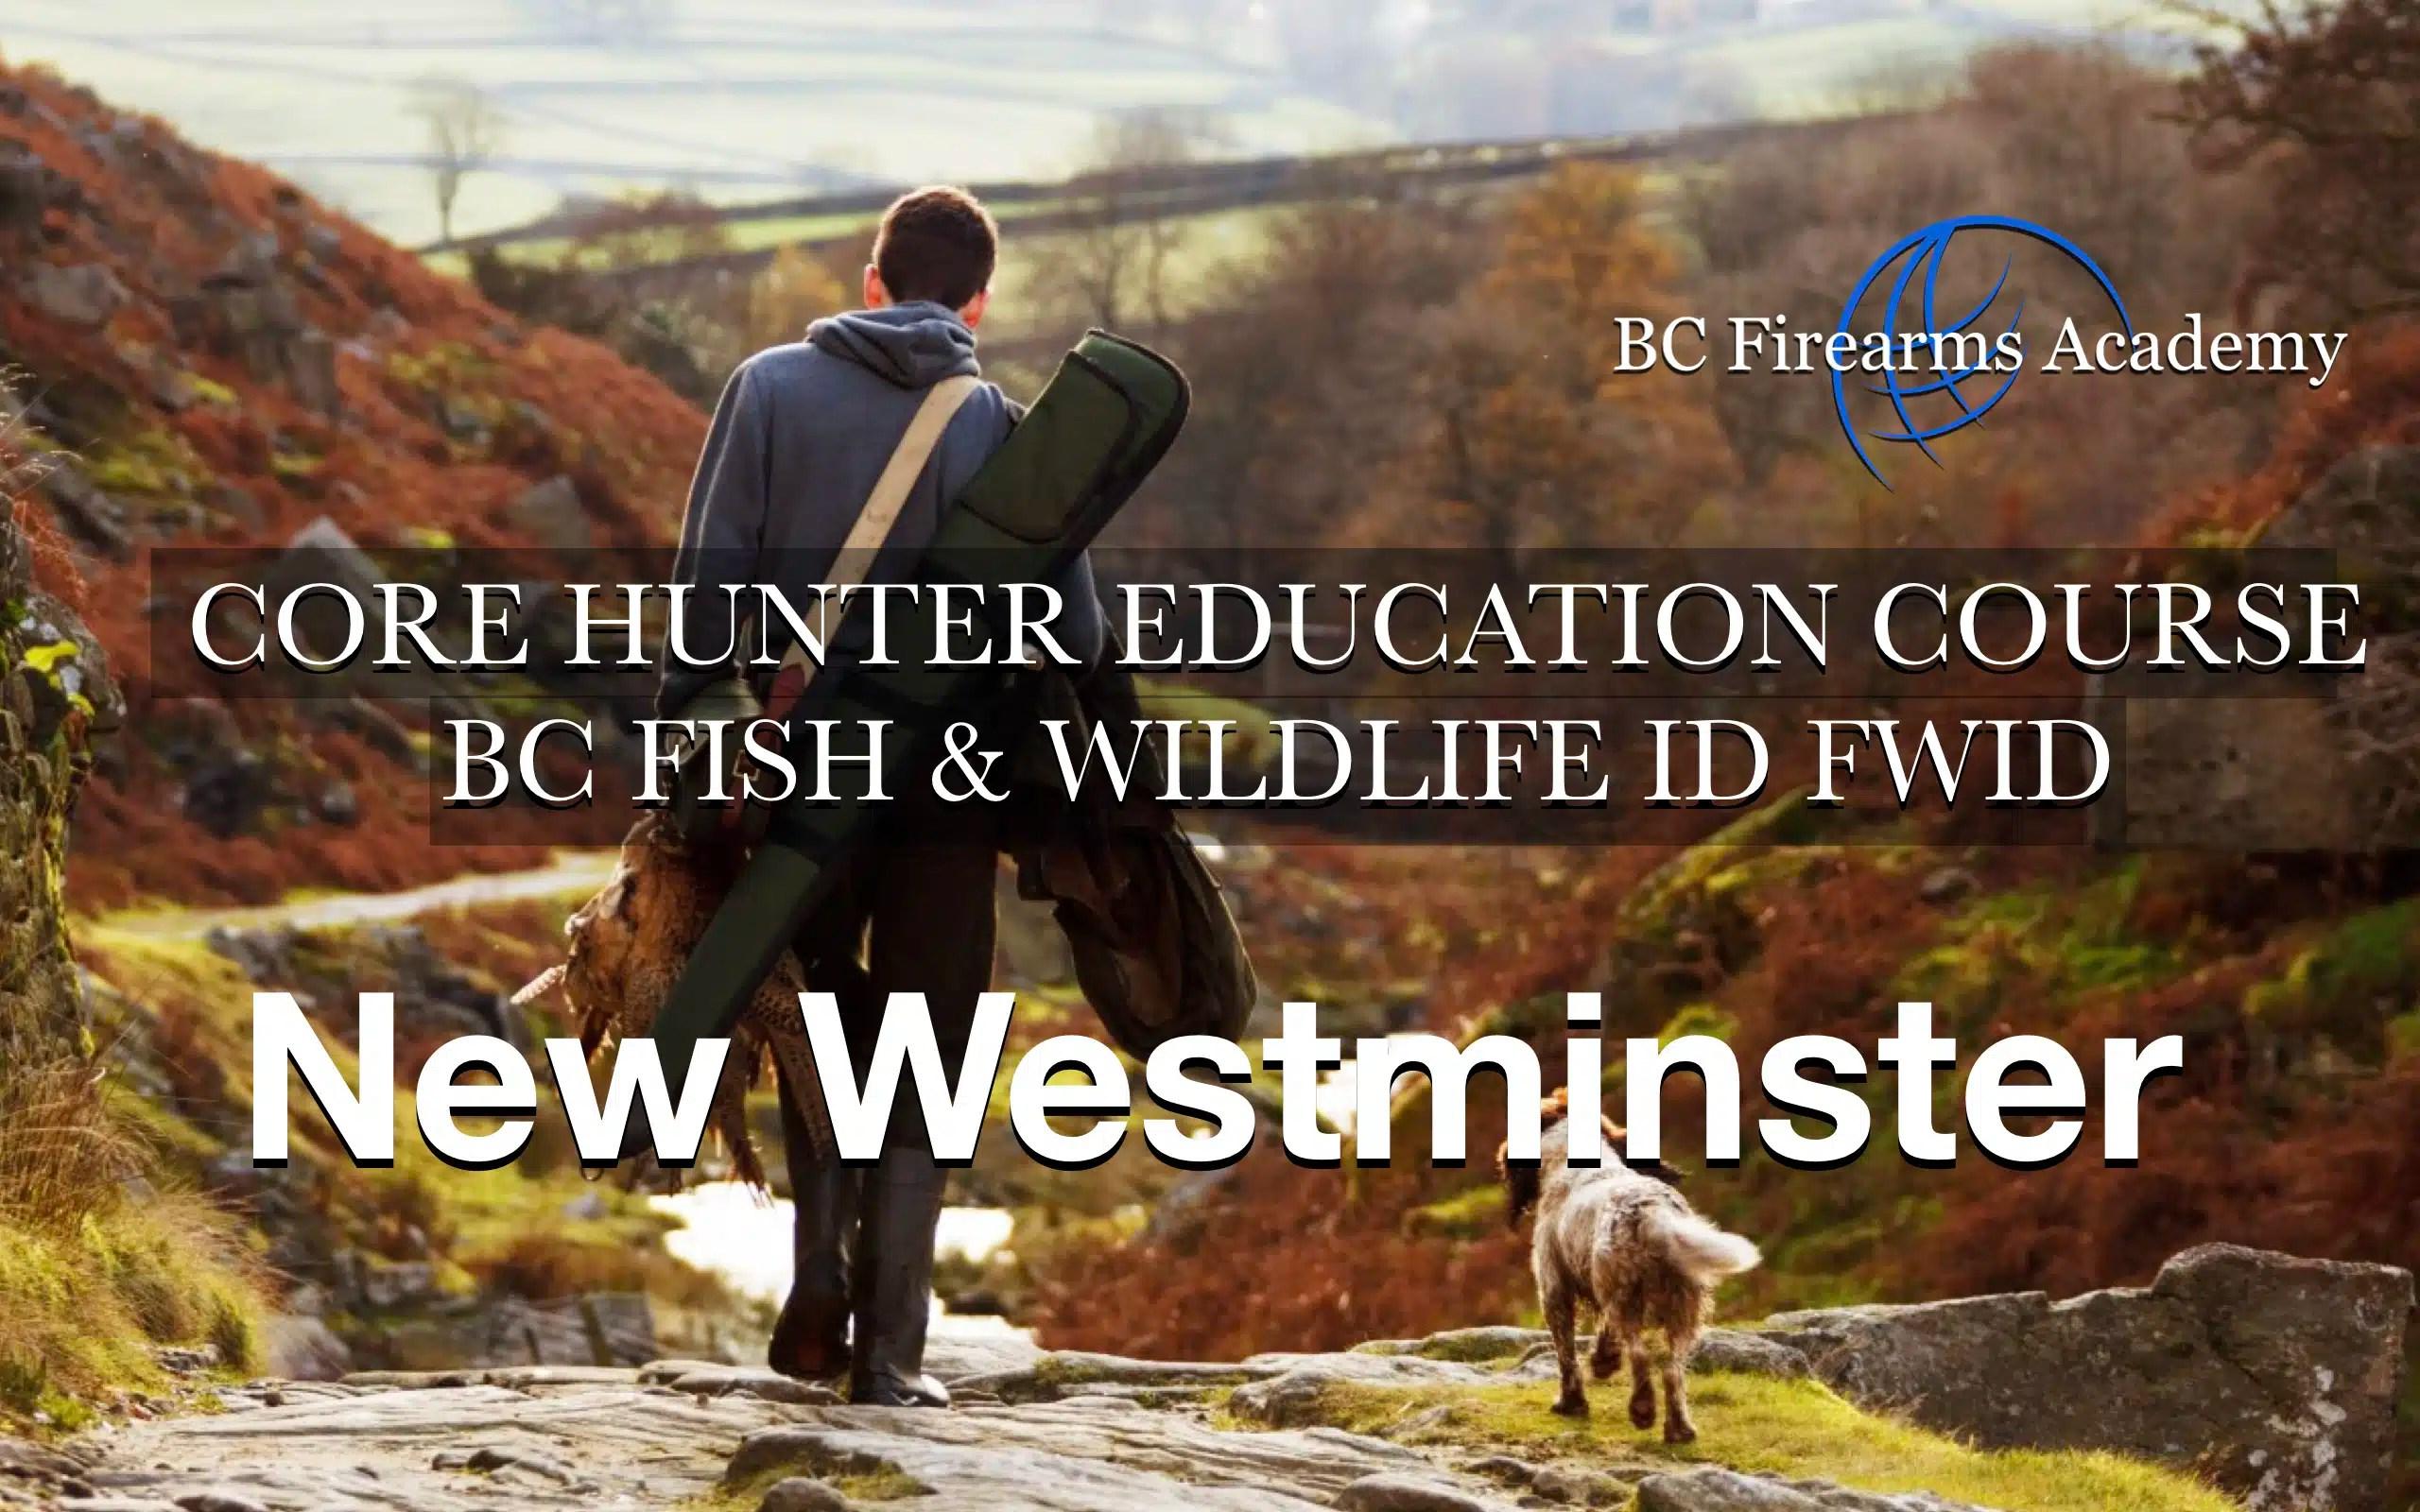 Courses-BC-Firearms-Academy-October-2019